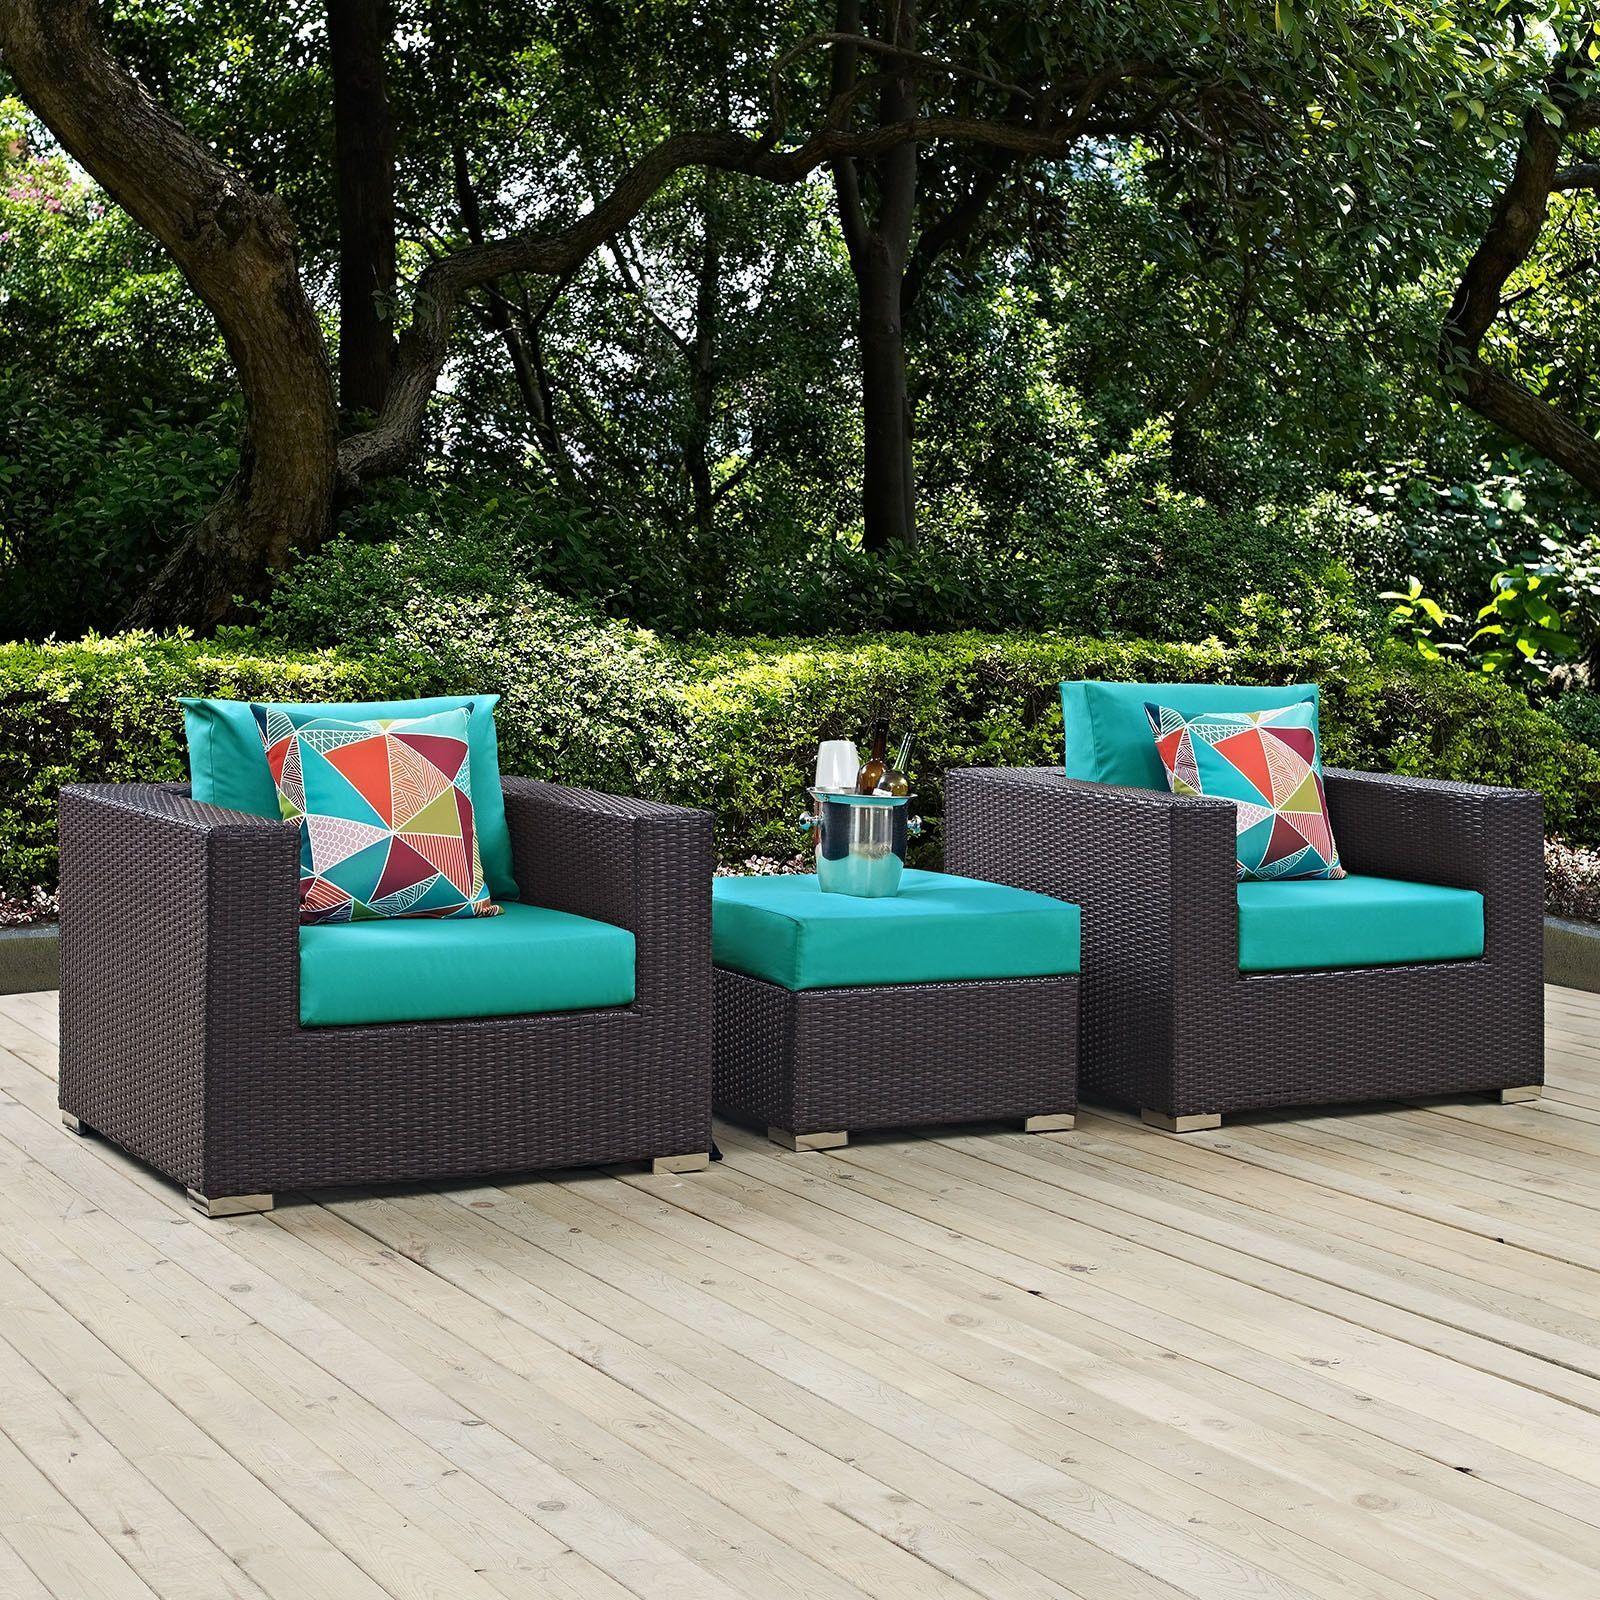 Modway Convene 3 Piece Outdoor Patio Sofa Set Espresso Beige f